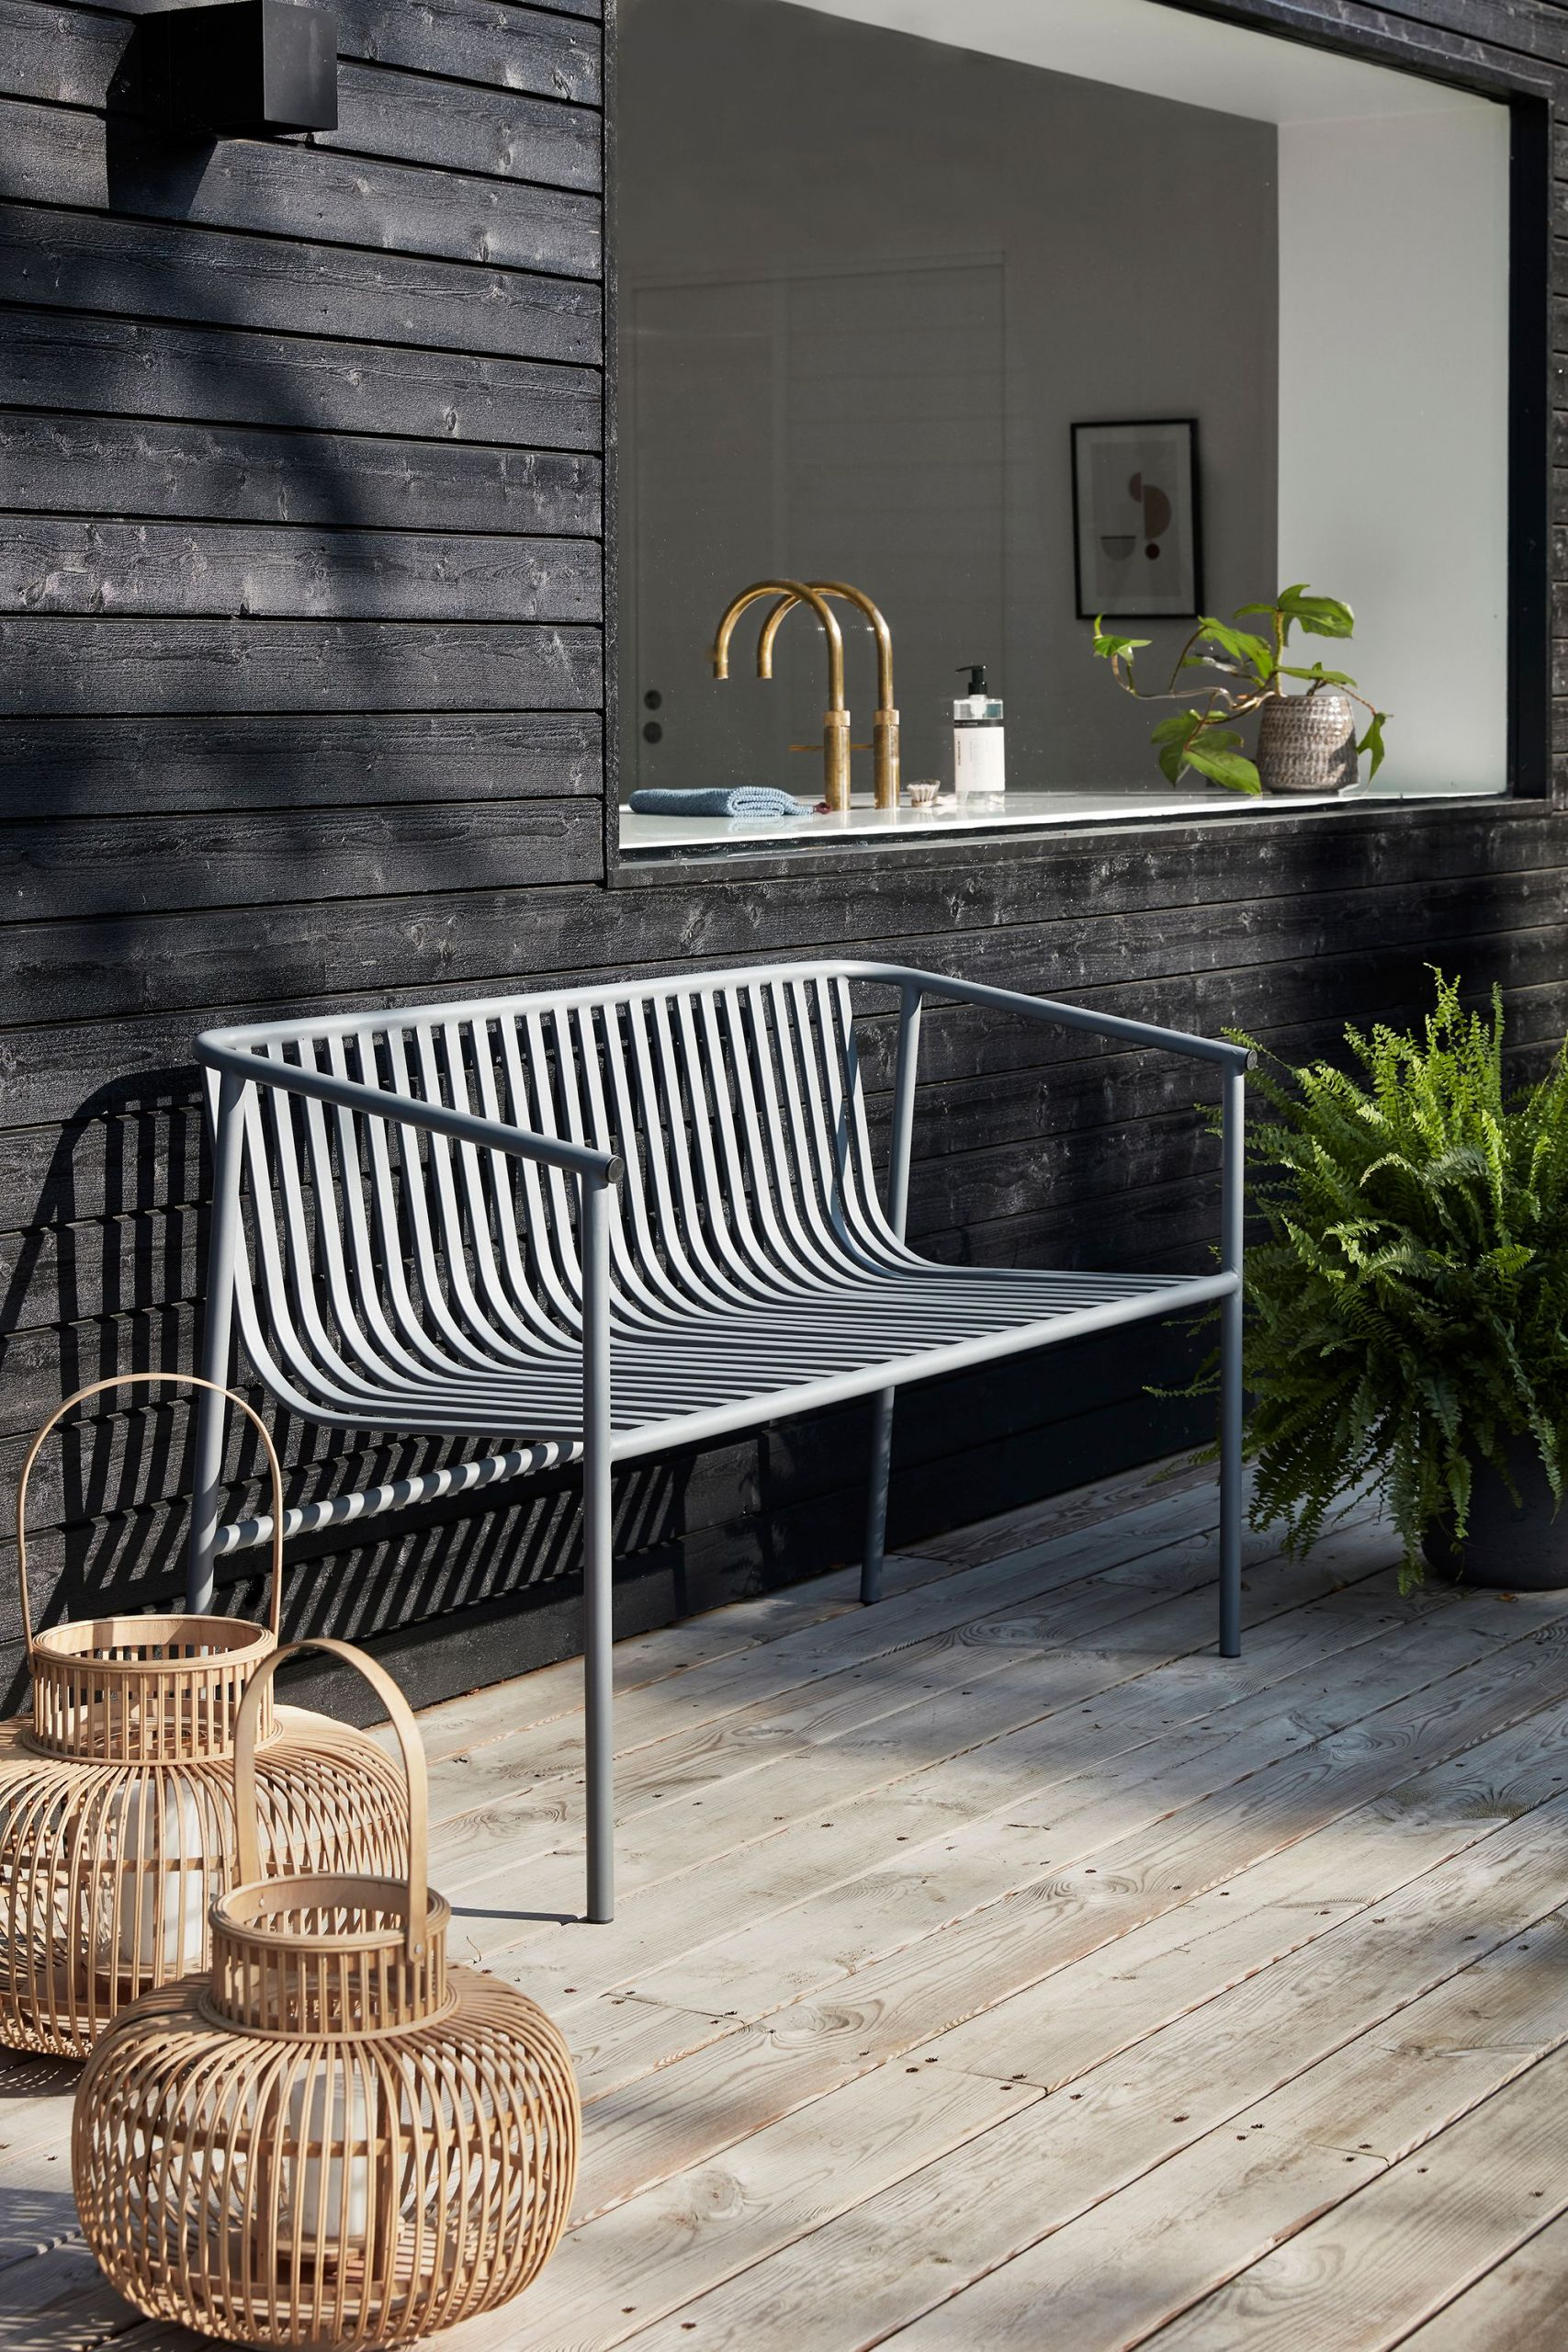 Solar Gartendeko Best Of Imagine Sitting Out Here In the Sun On This Modern Bench